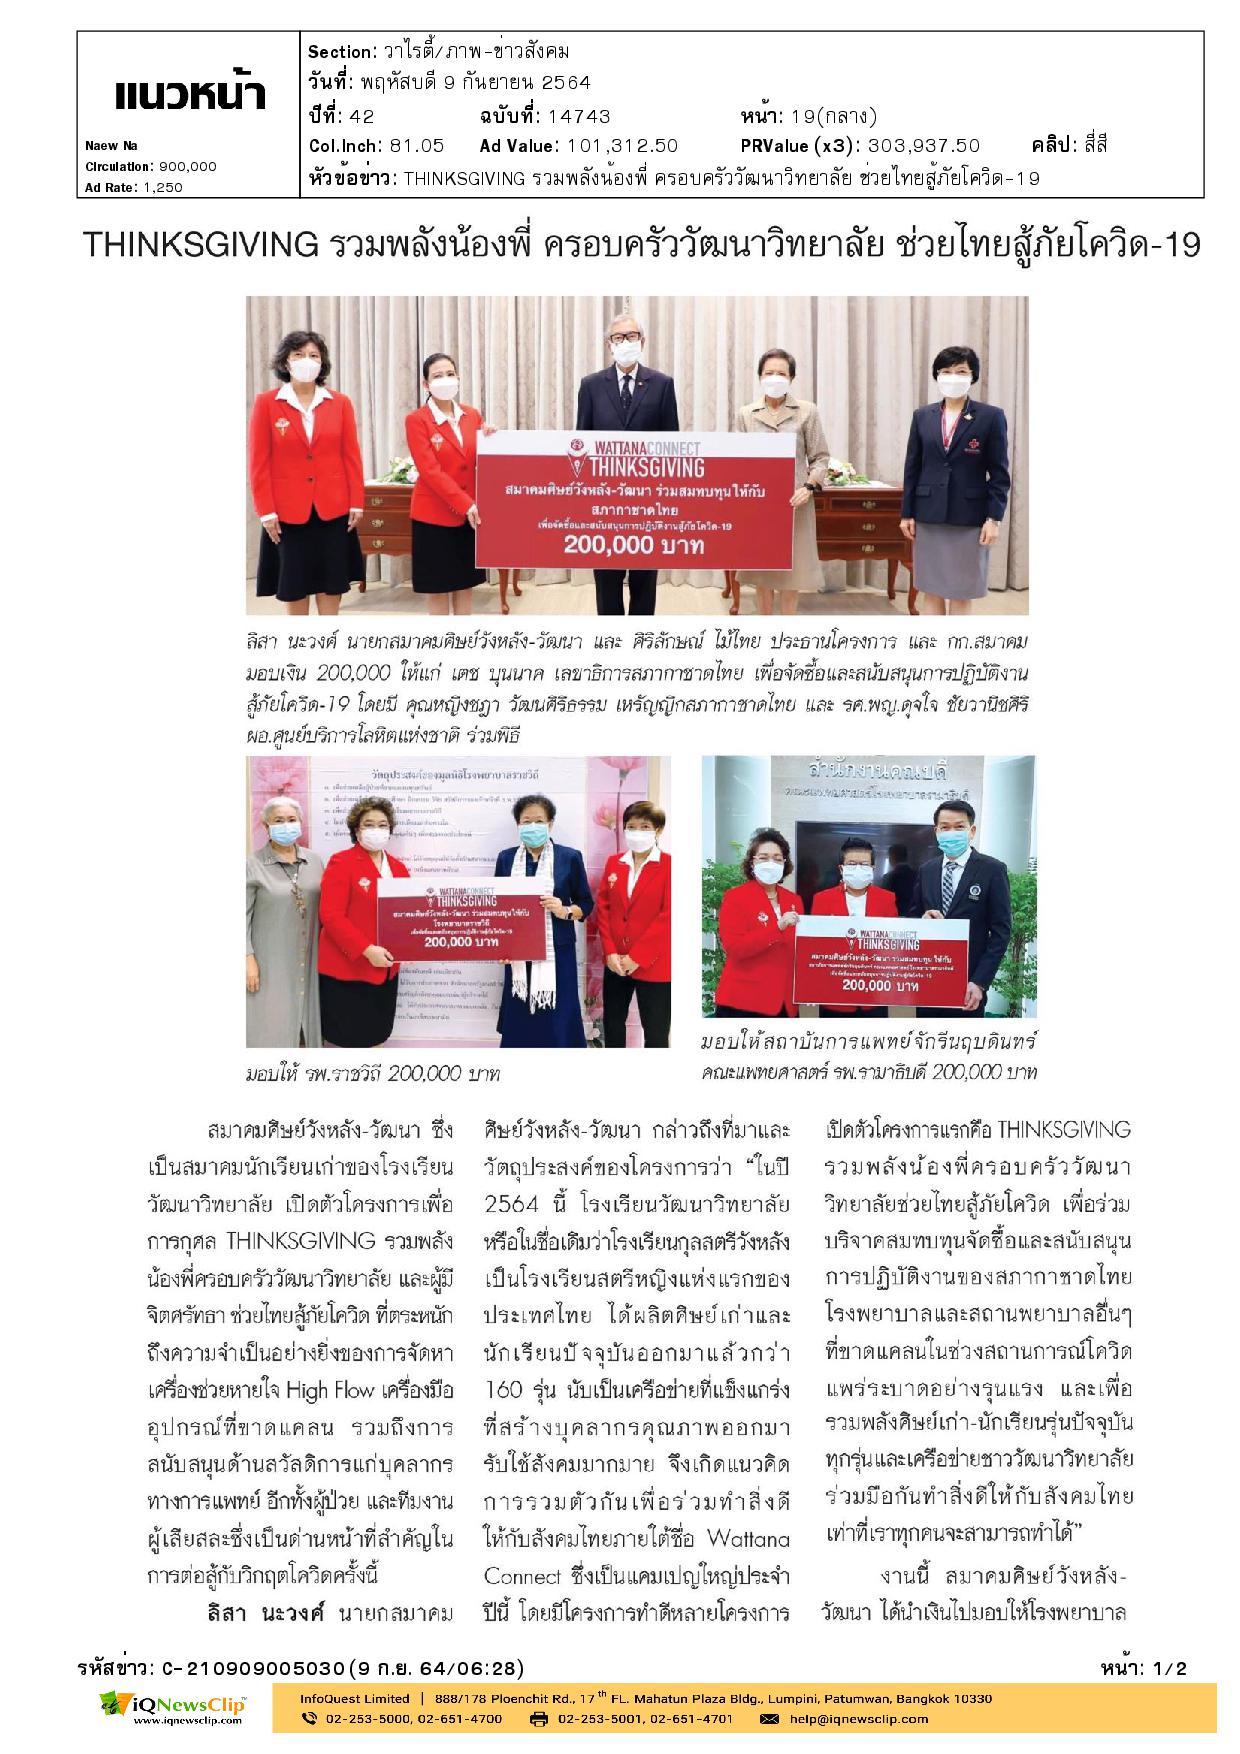 THINKSGIVING รวมพลังชาววัฒนาวิทยาลัยช่วยไทยสู้ภัยโควิด